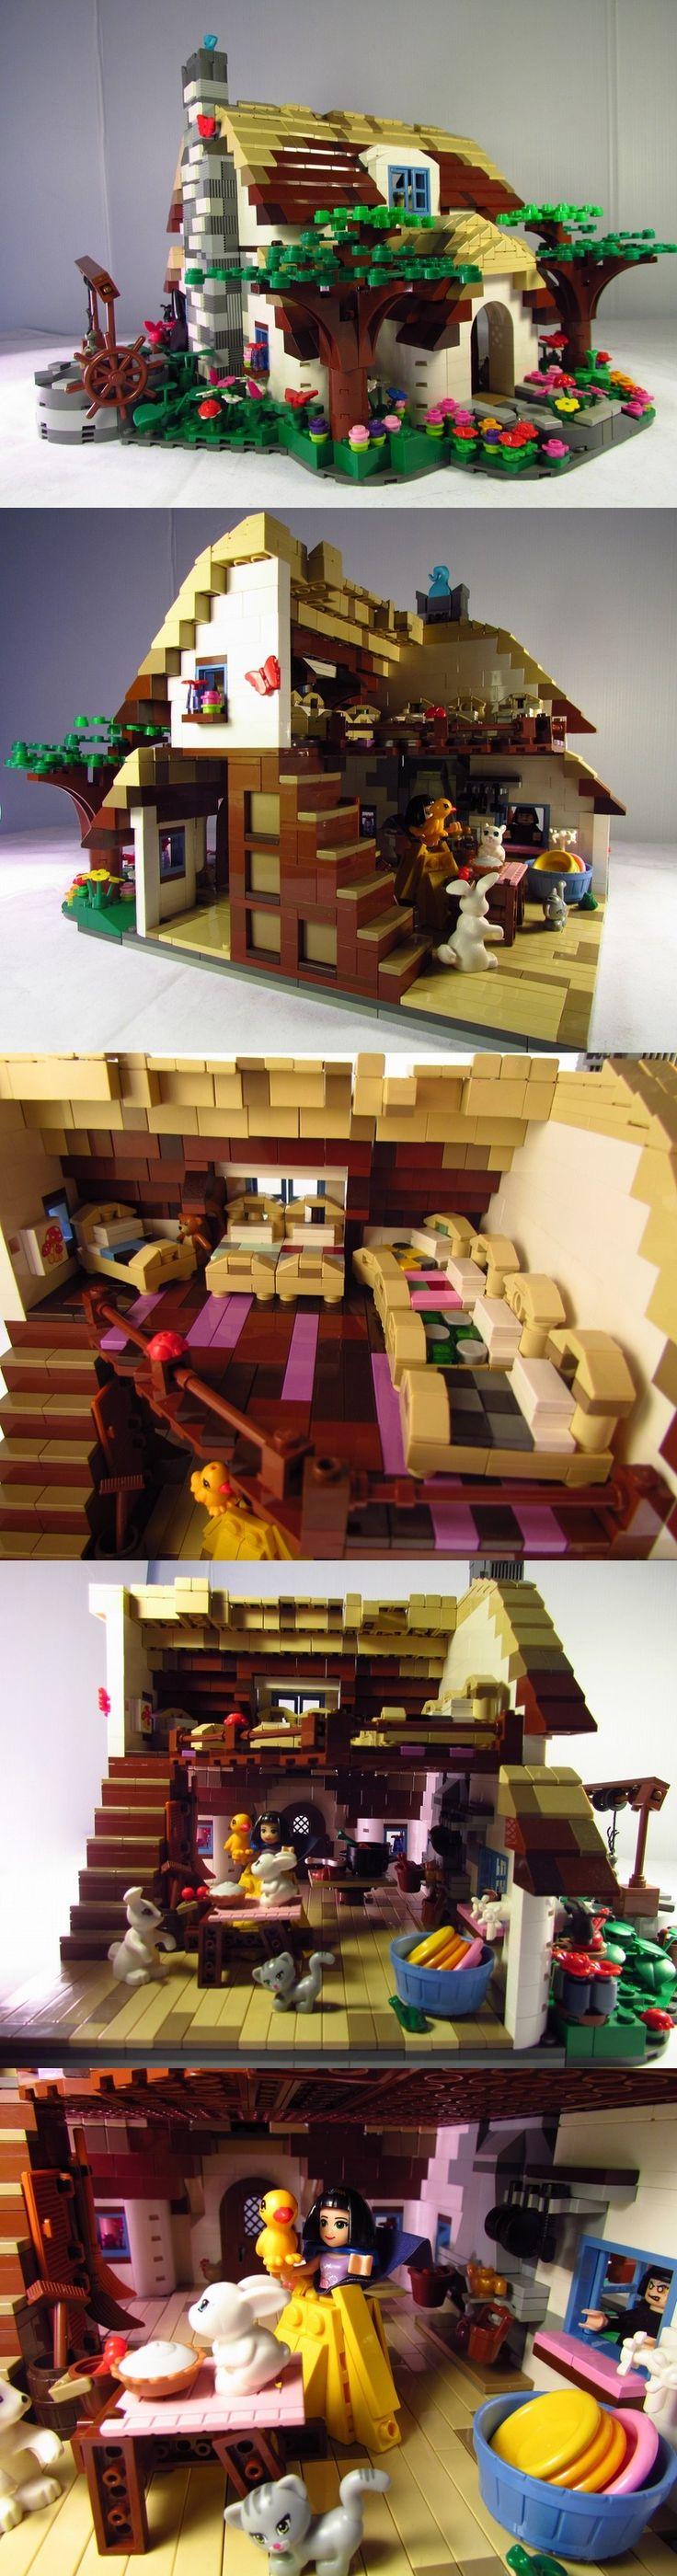 Dwarves Cottage #LEGO #Dwarves Nice use of the Lego Friends pieces.